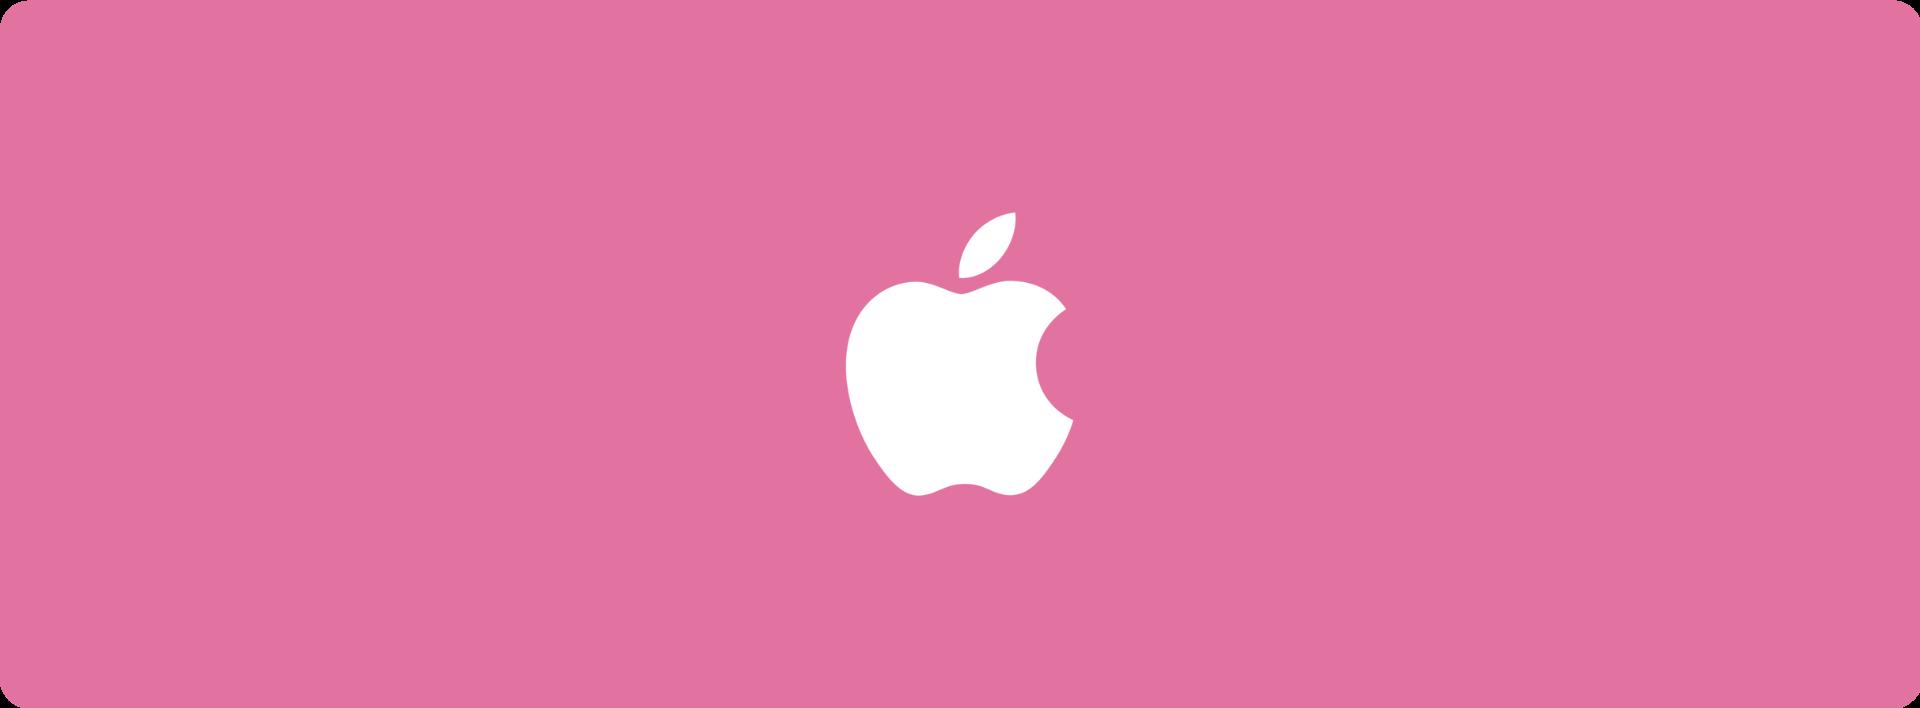 Apple Image, Education Perfect